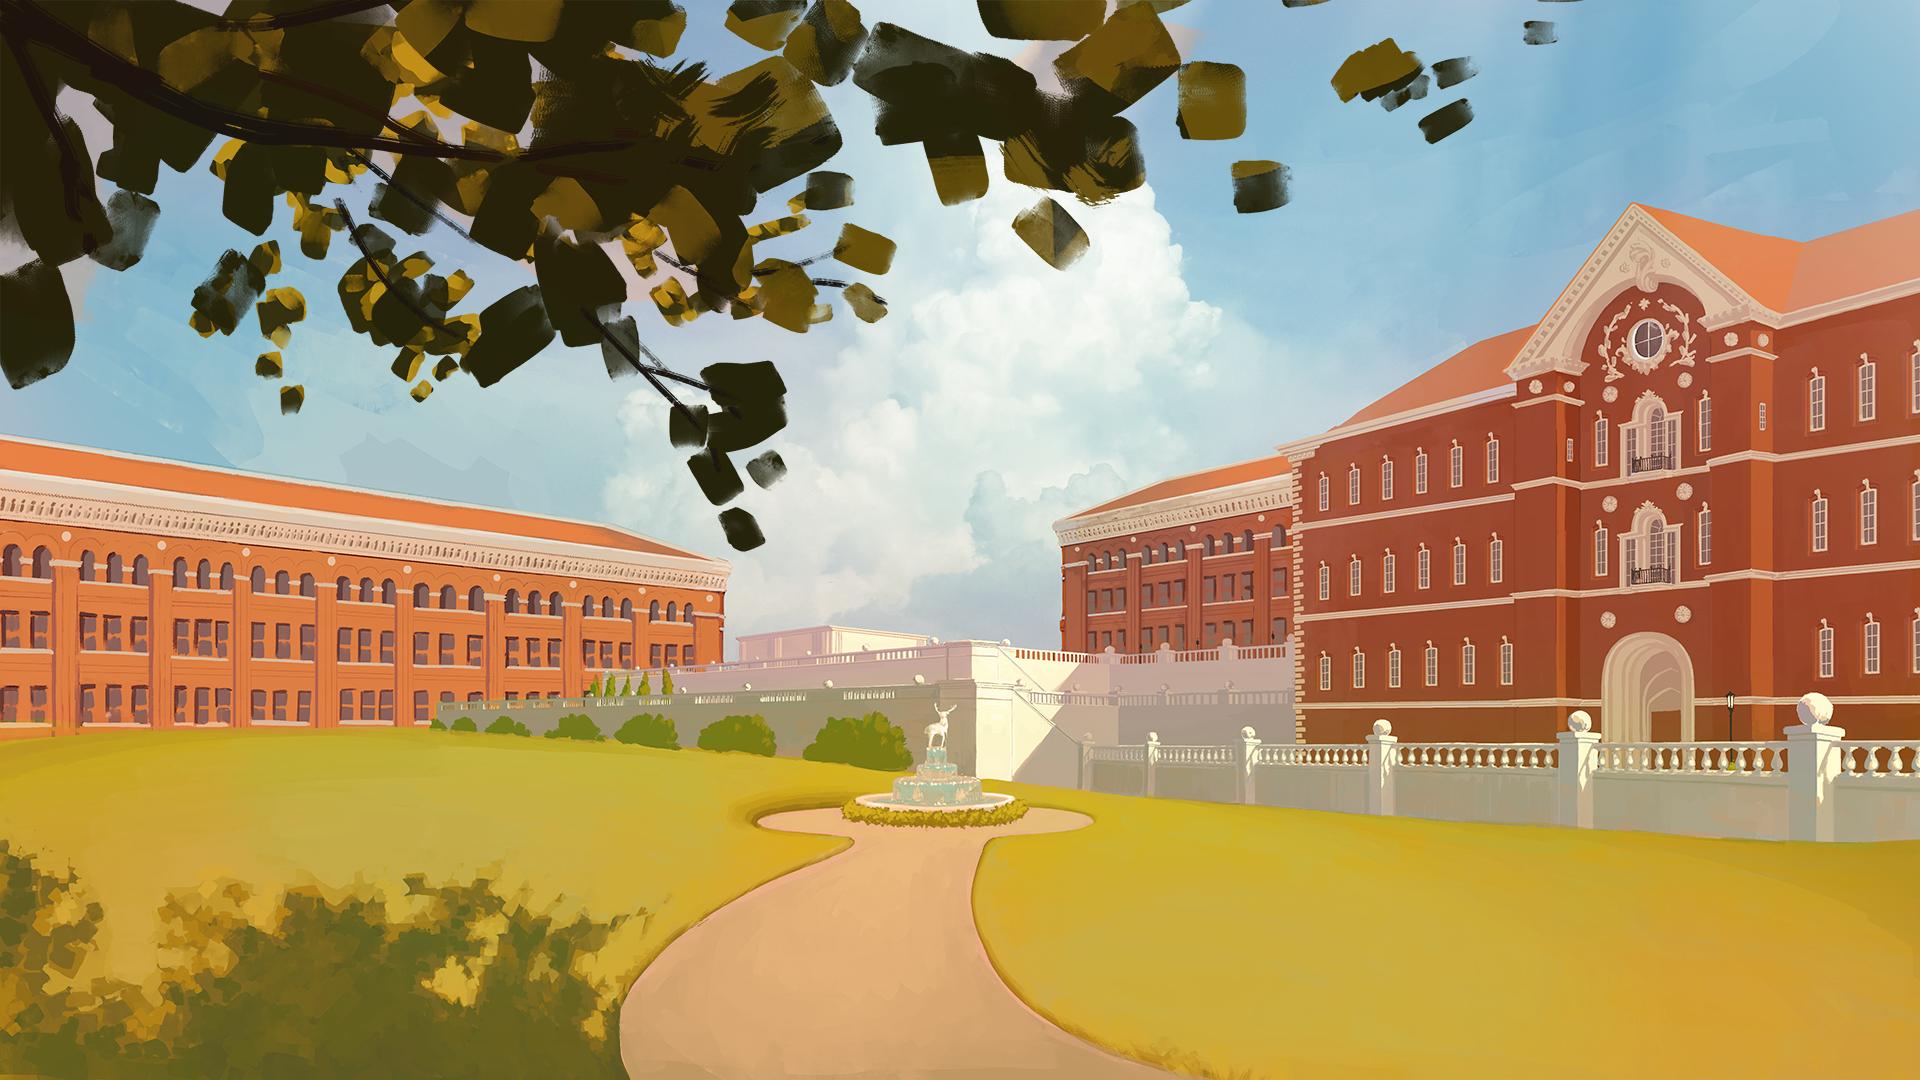 University Courtyard 01 | B. Chau